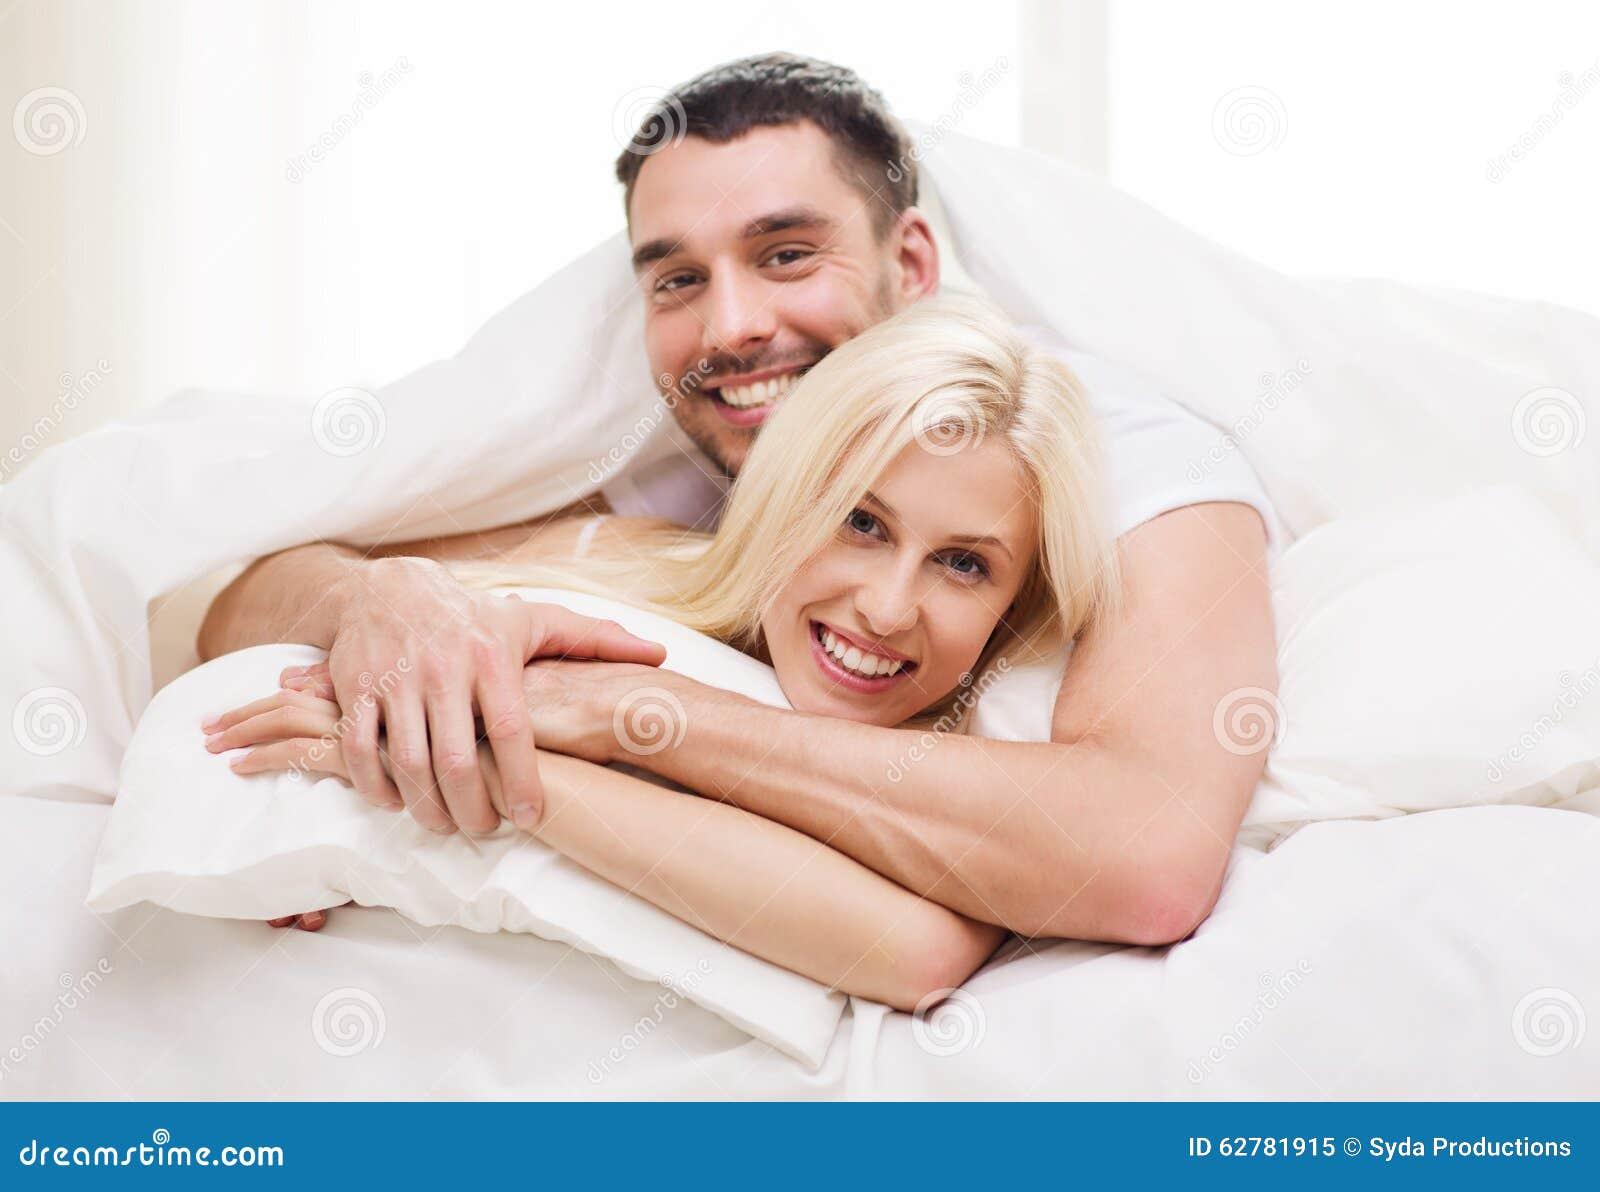 Romantic Couple In Bedroom Bedroom Decorating Ideas